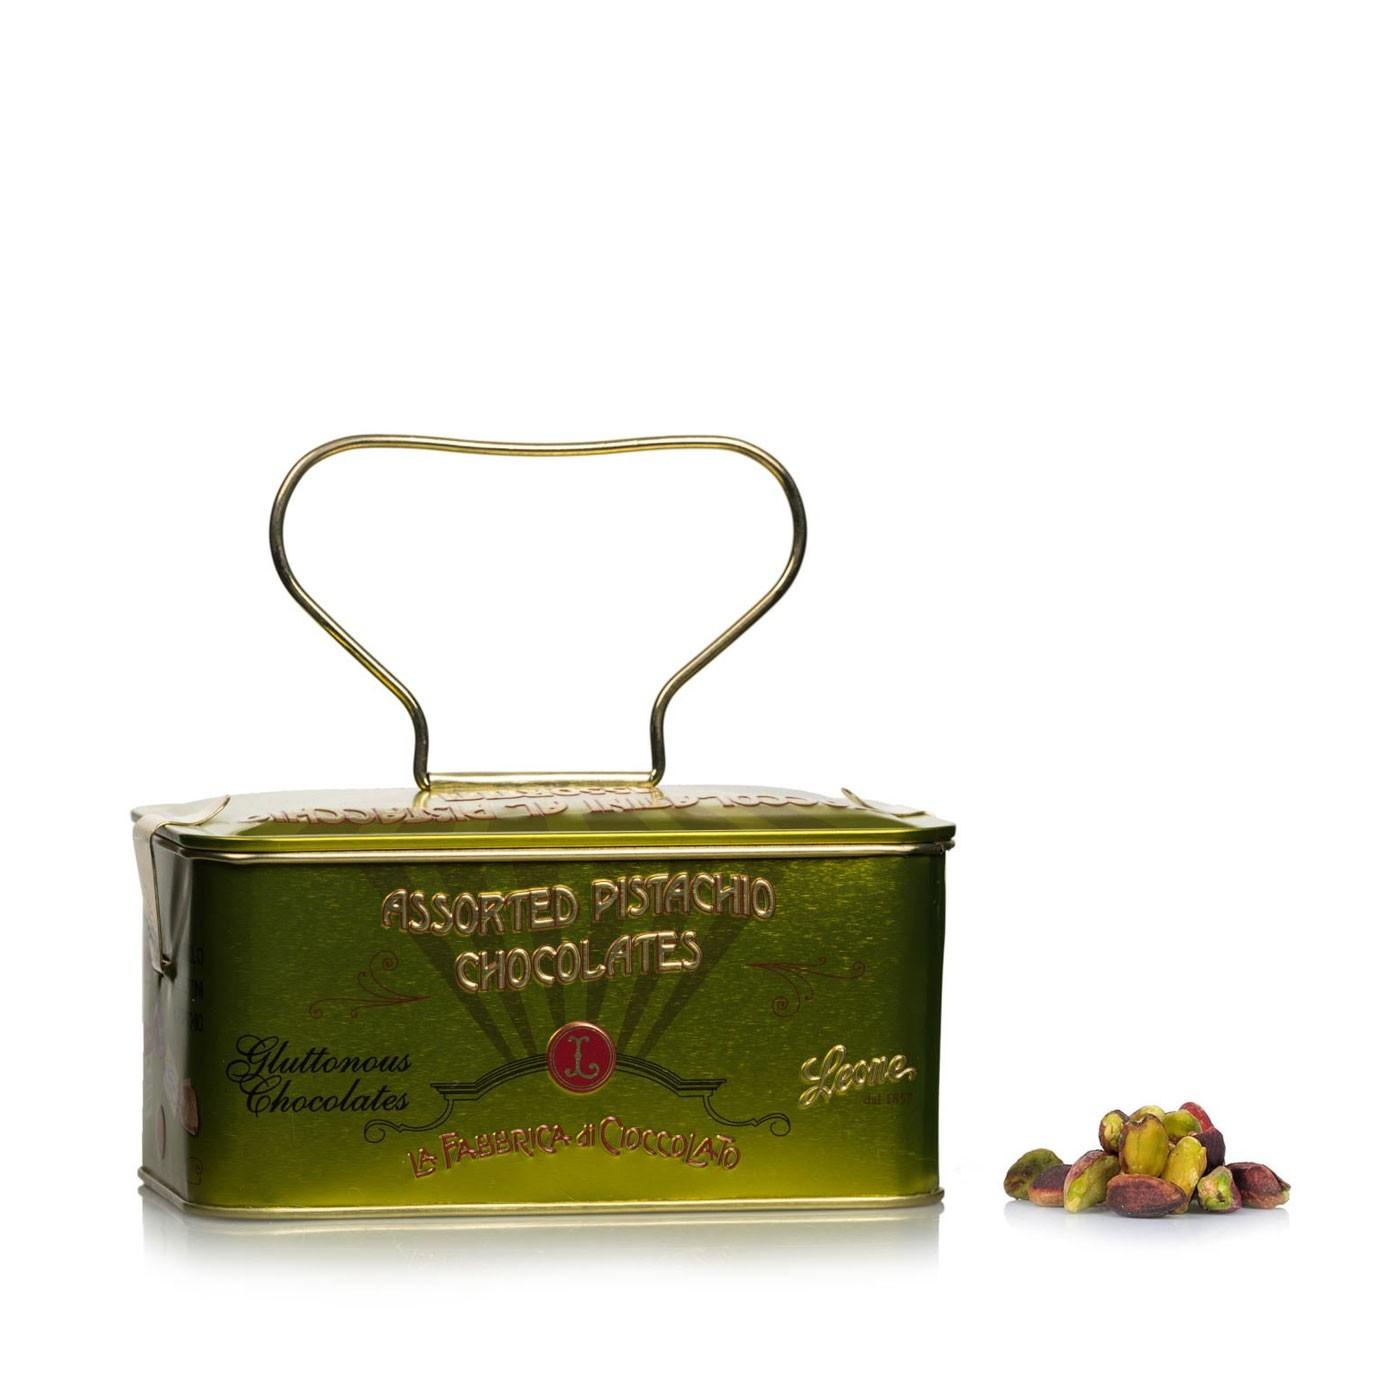 Assorted Pistachios Truffles in Box 5 oz